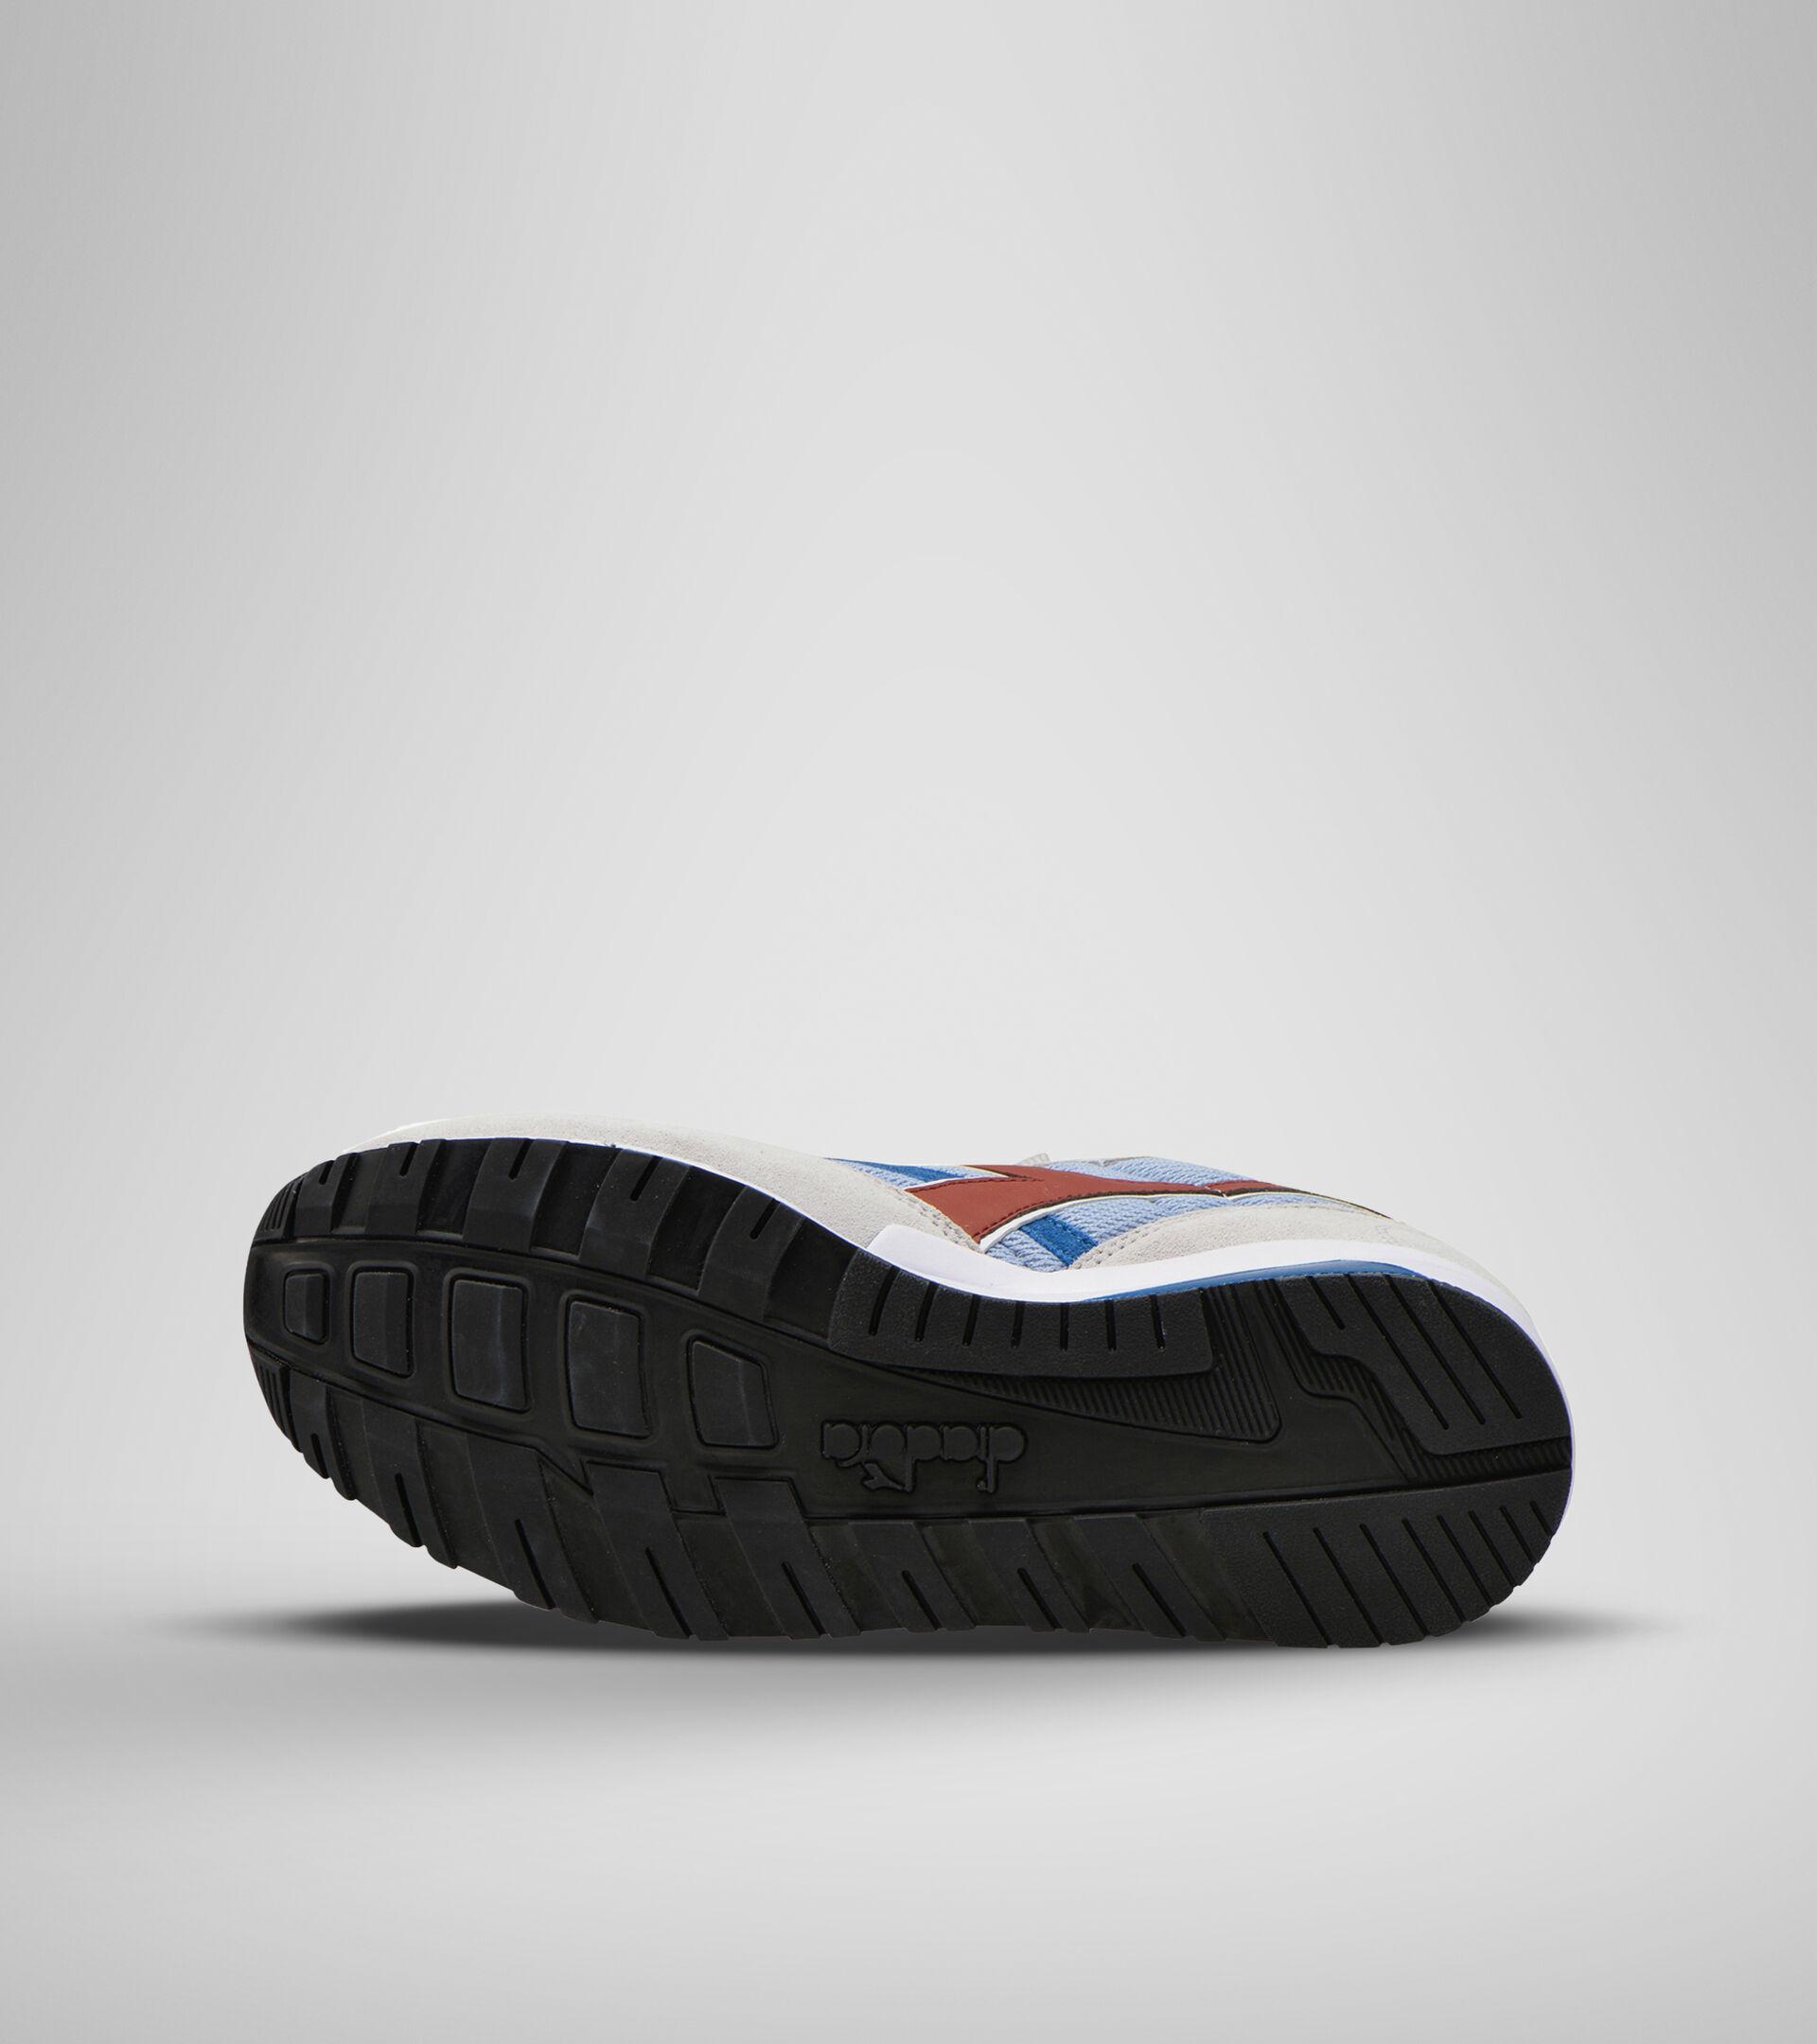 Zapatilla deportiva - Unisex N902 S AZUL ALBA/ROJO FLUO/AZL MIKONO - Diadora